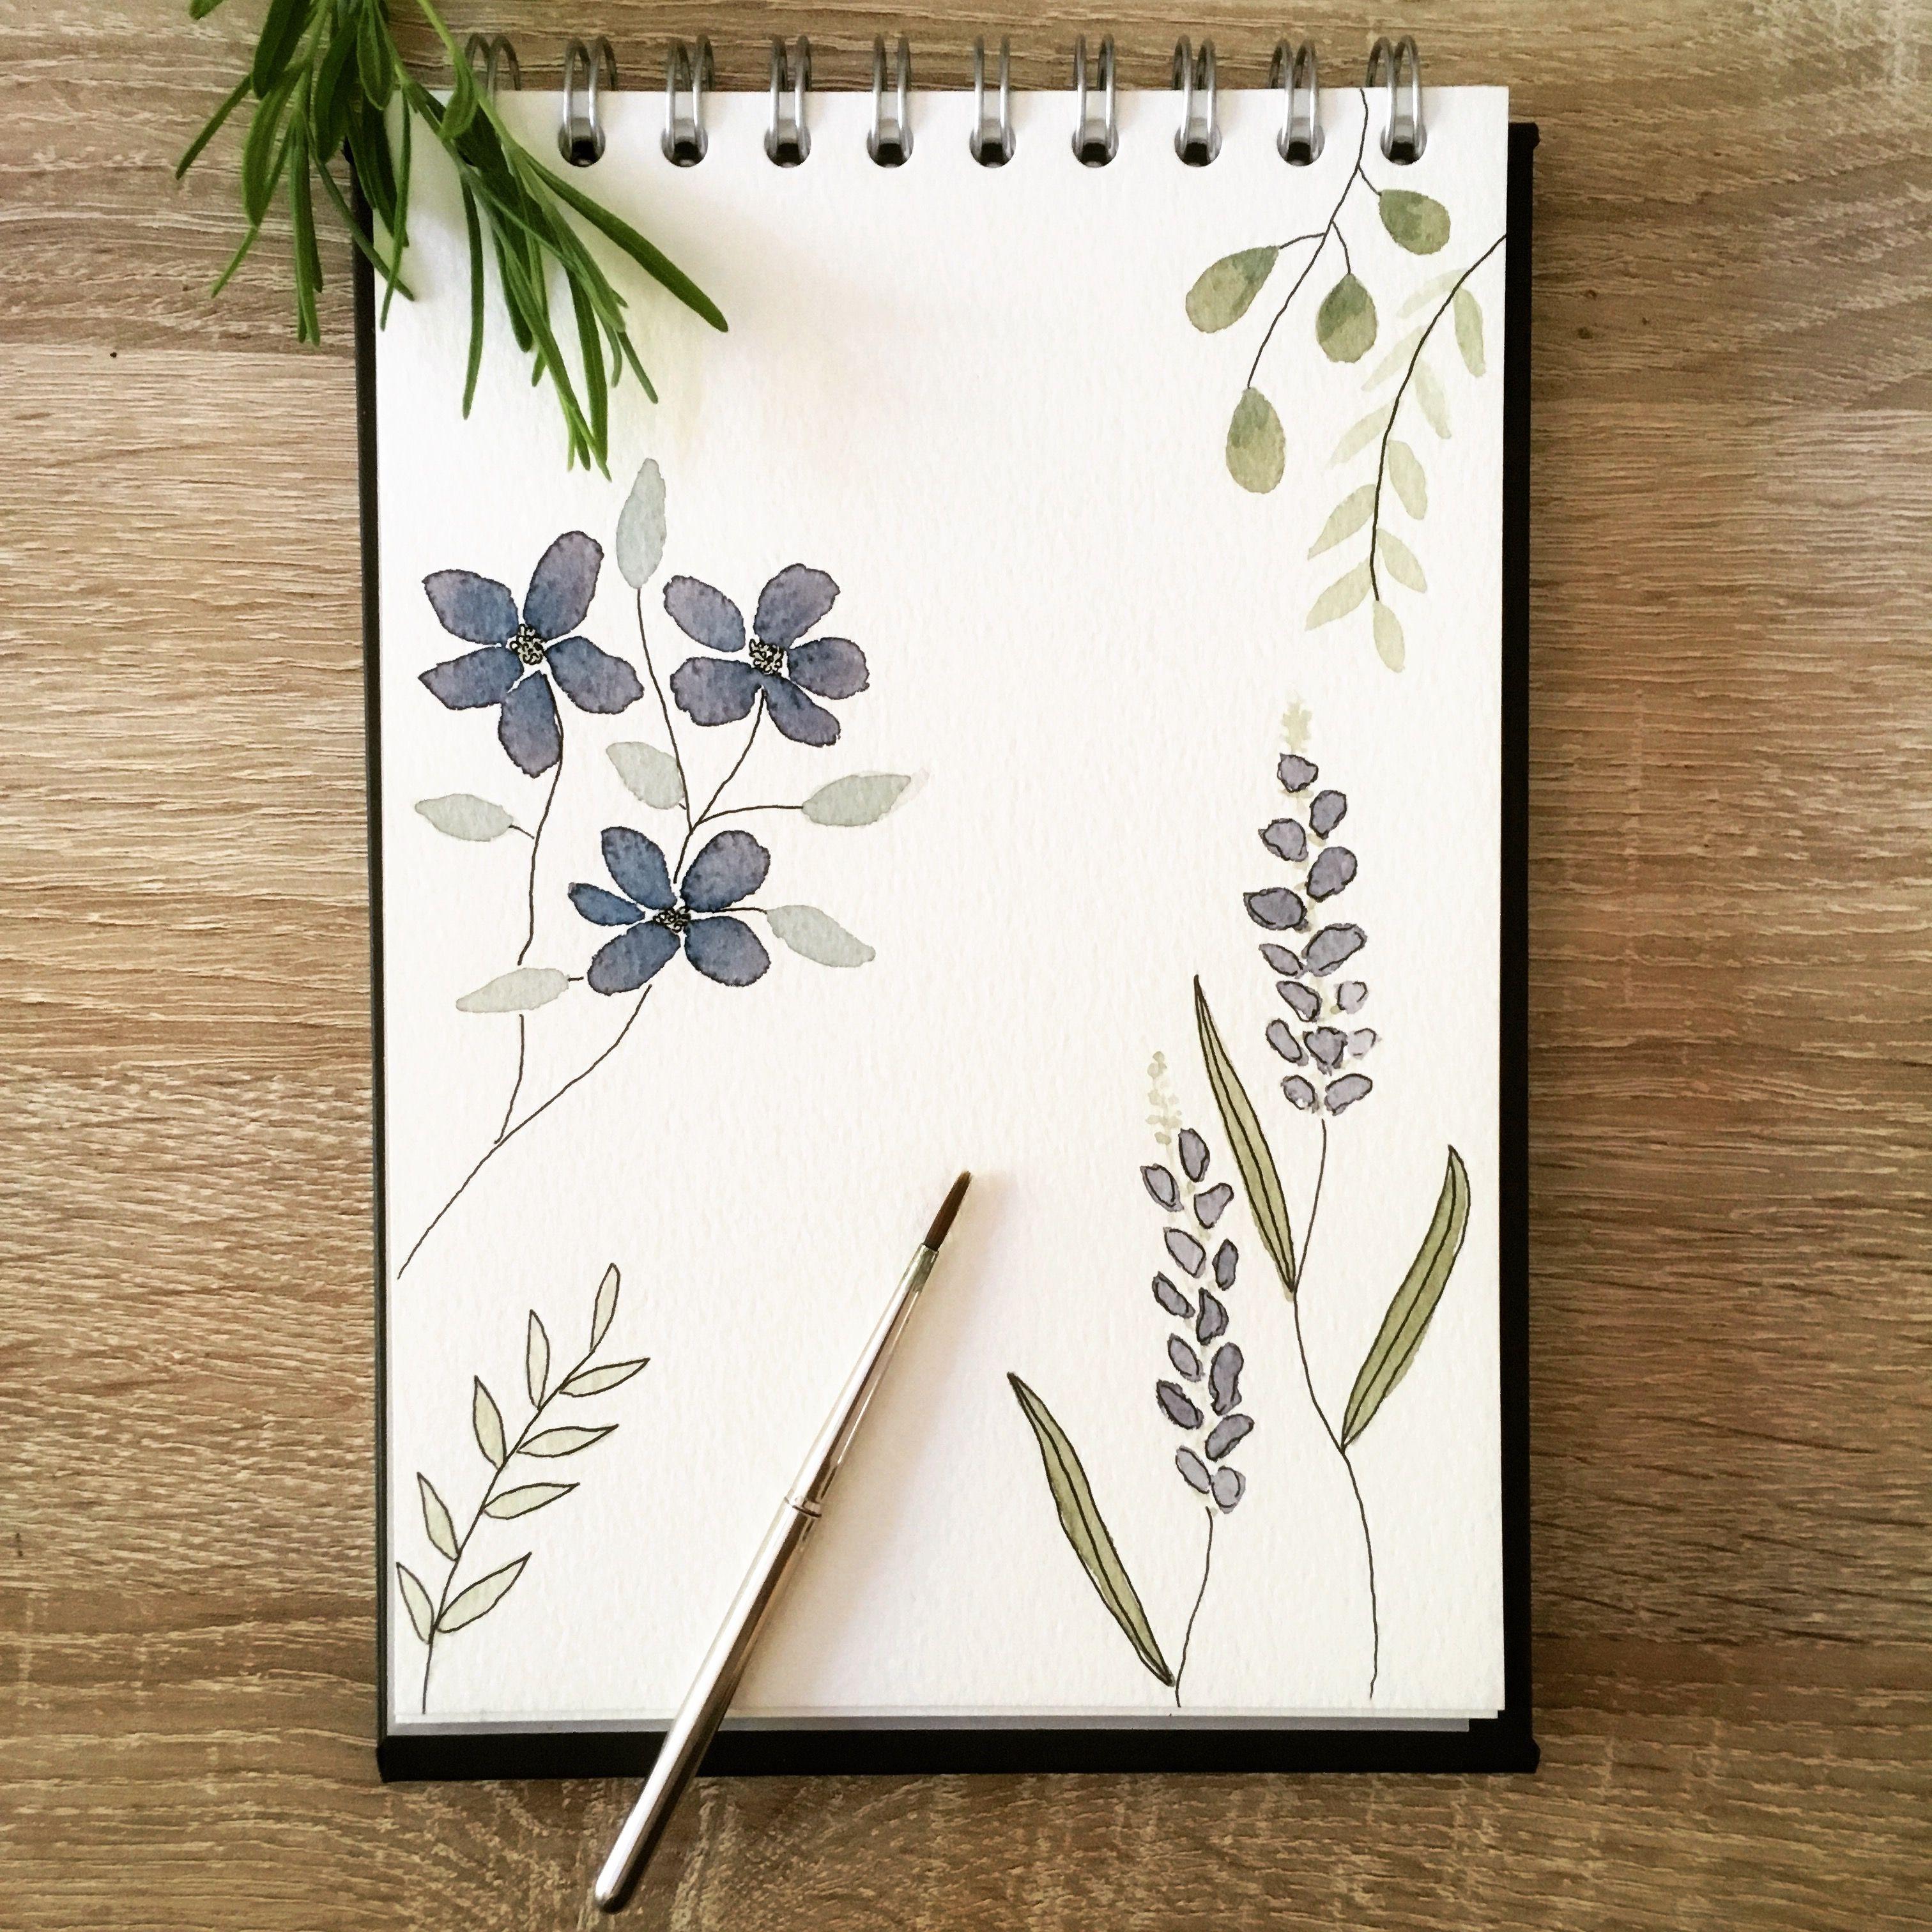 Pflanzen Illustration Malen Aquarell Blumen Floral Botanical